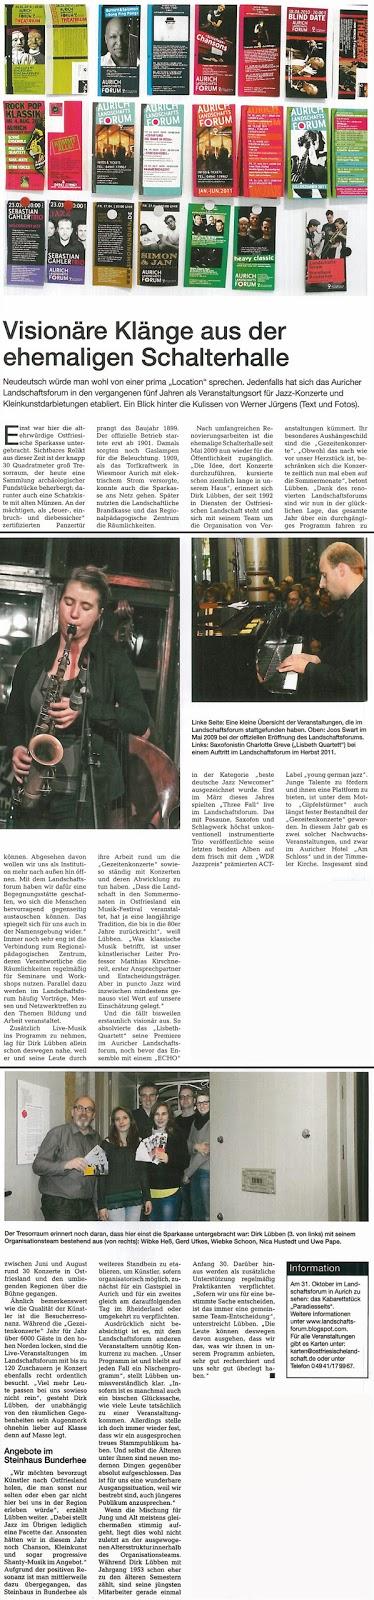 http://www.ostfriesischelandschaft.de/fileadmin/user_upload/Gezeiten-Konzerte/JPEG_2014/2014-10_OMa_S94-97.jpg